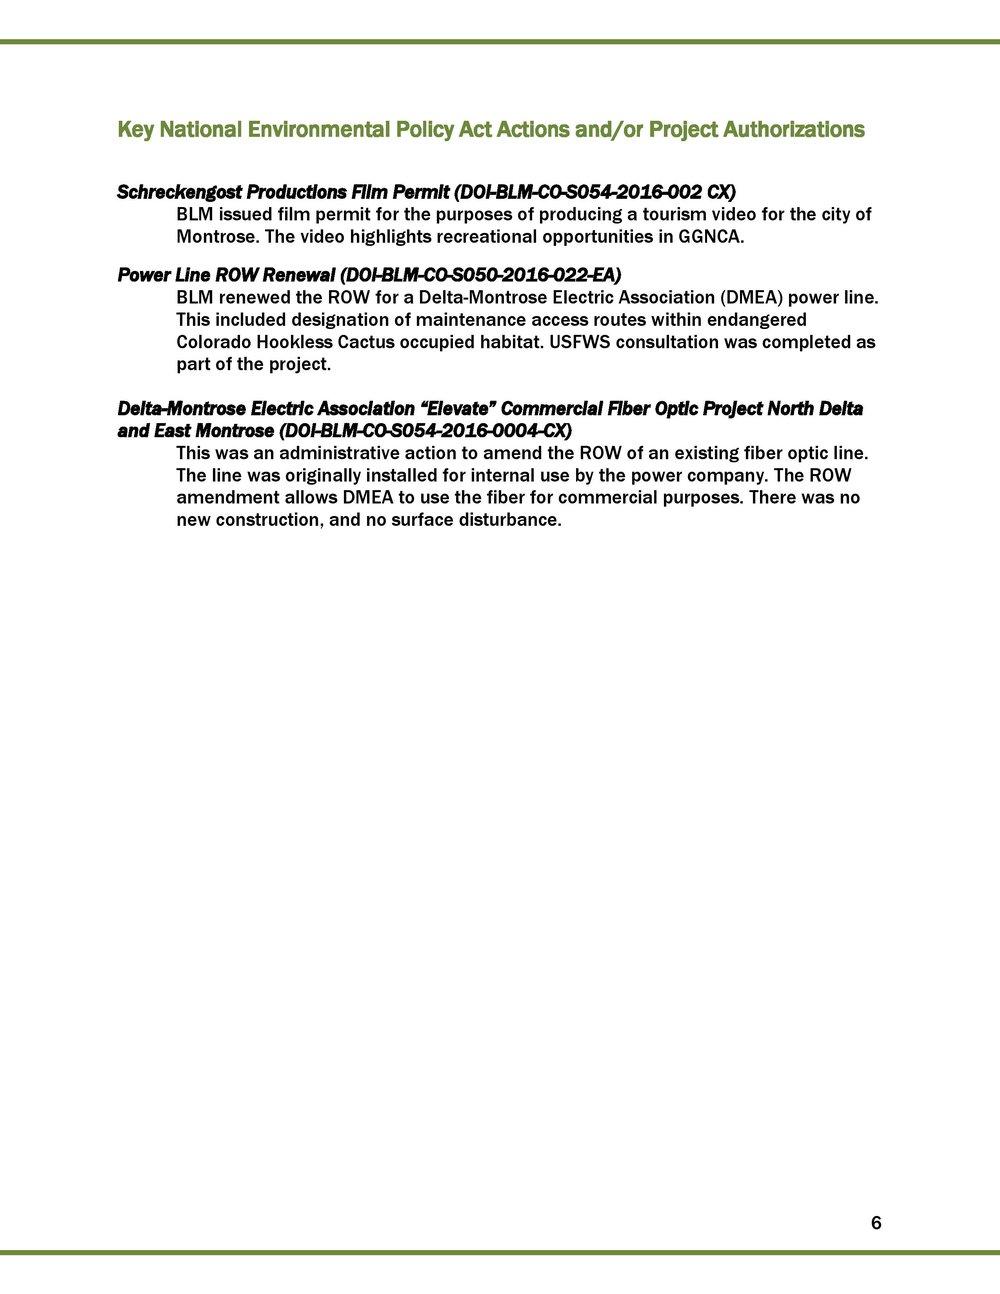 2016 FINAL GGNCA REPORT_2017_02_01-page-007.jpg